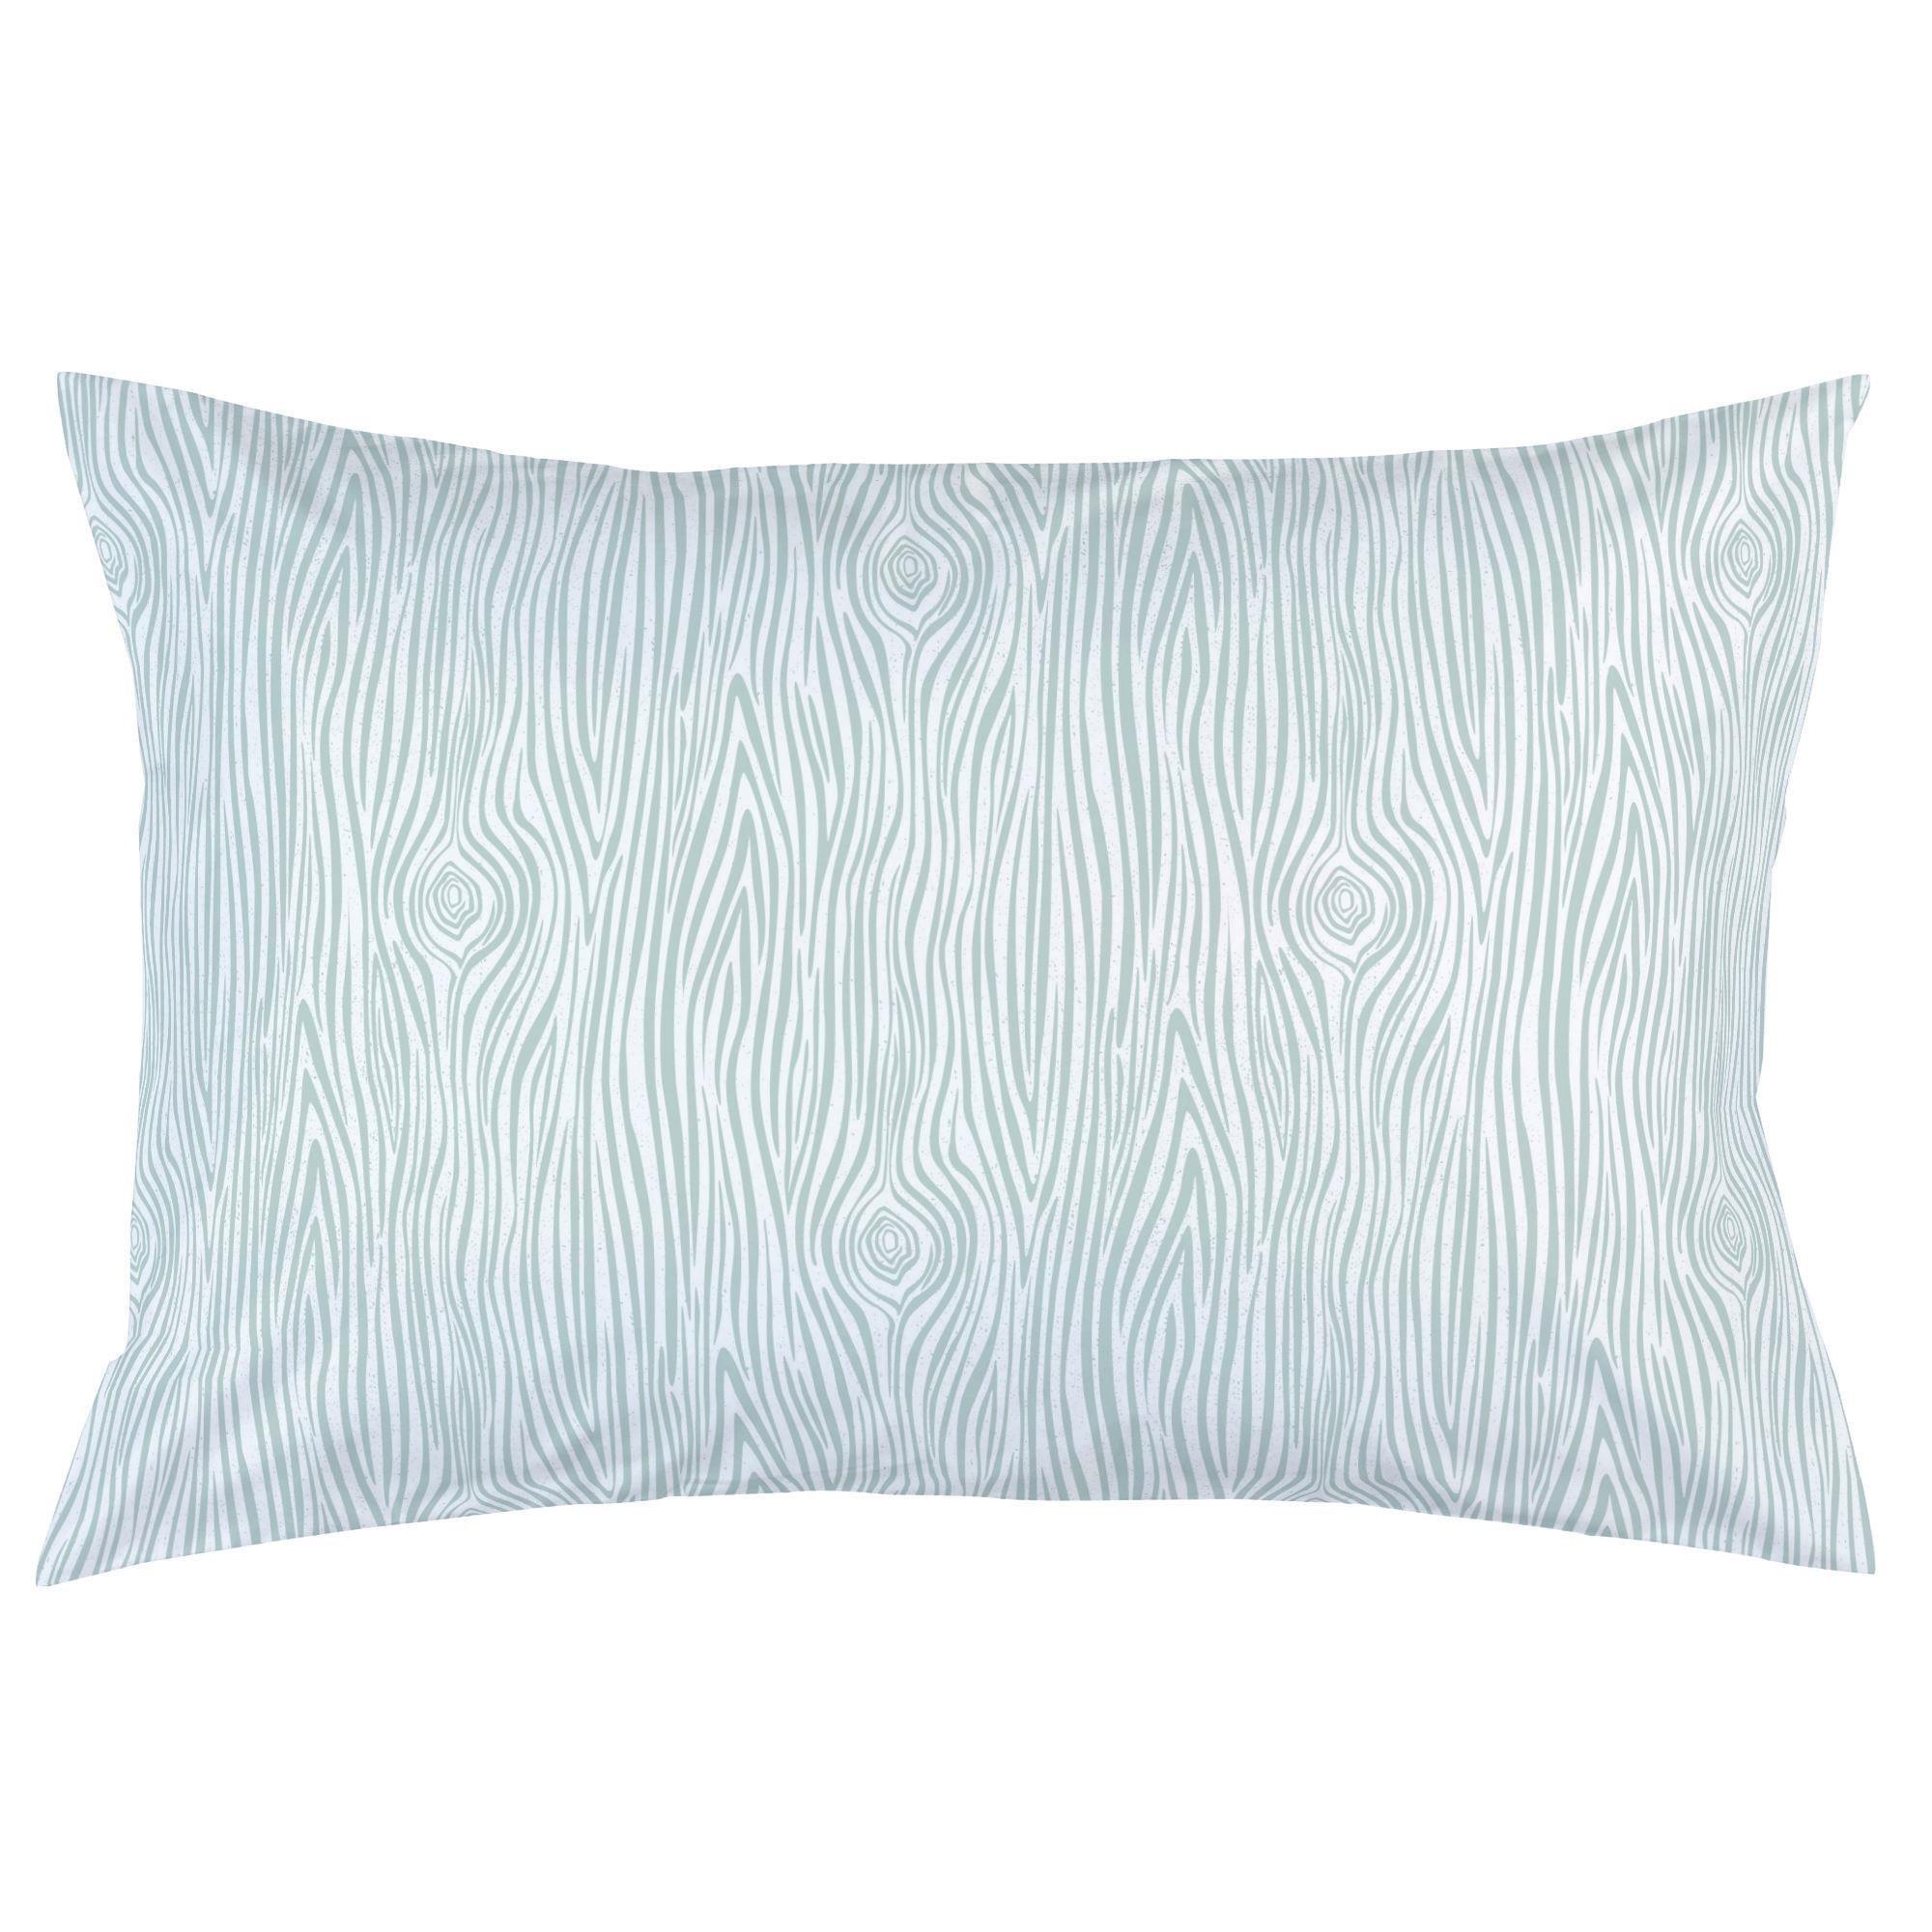 Carousel Designs Seafoam Woodgrain Pillow Case - Organic 100% Cotton Pillow Case - Made in the USA